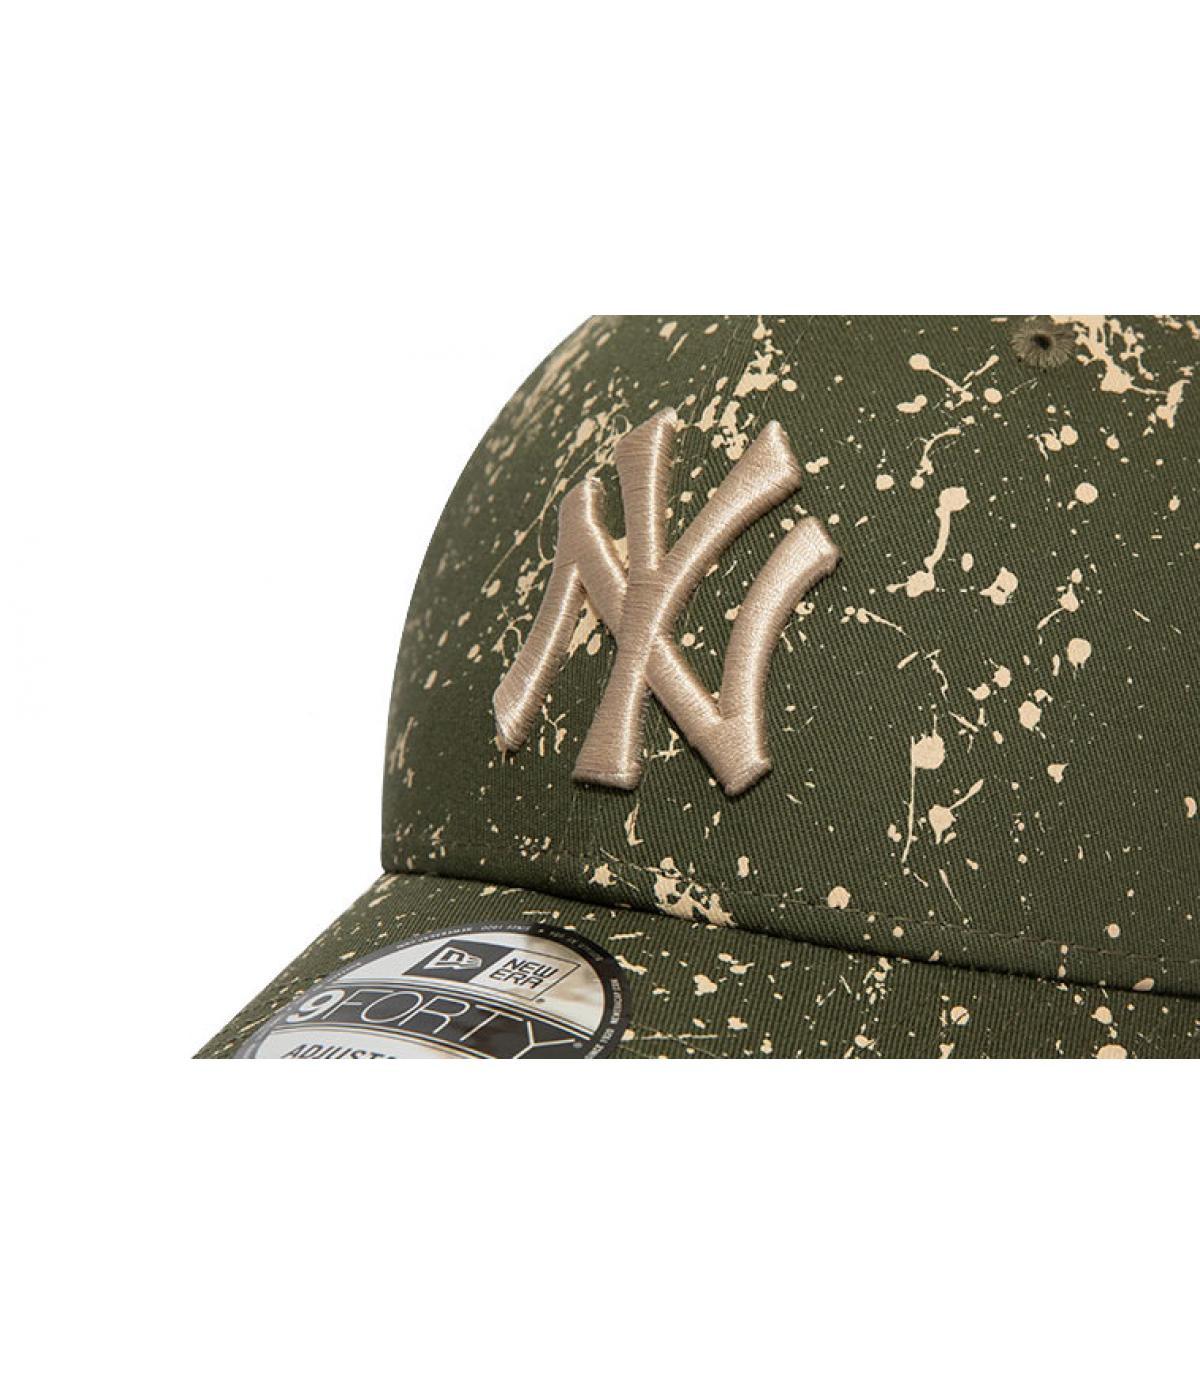 Details Cap MLB Paints NY 940 olive - Abbildung 3